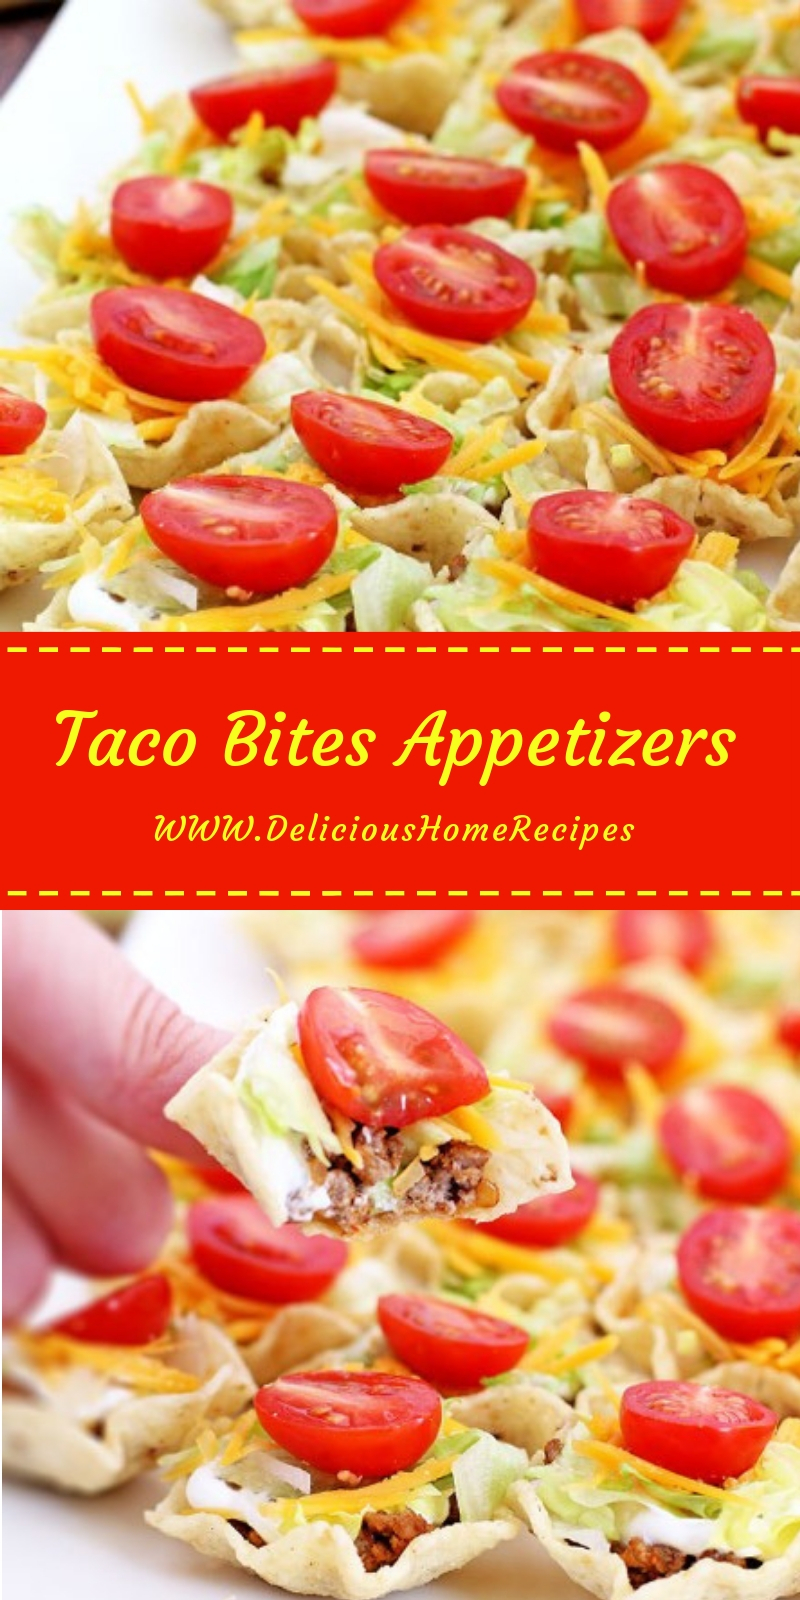 Taco Bites Appetizers